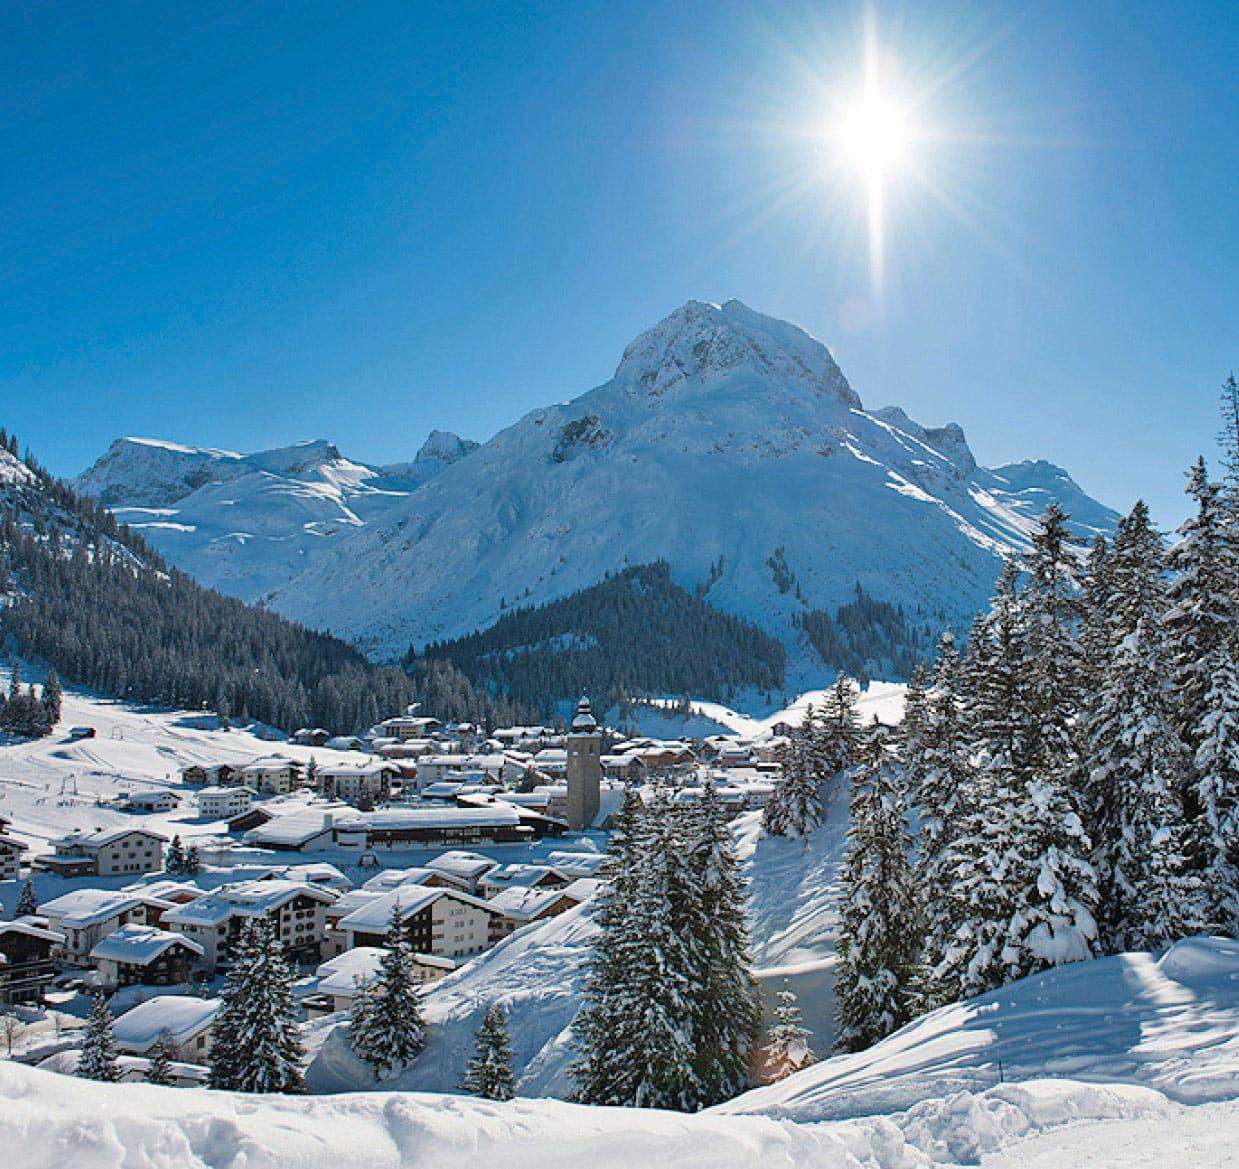 Appart Andrea - Lech Urlaub im Winter